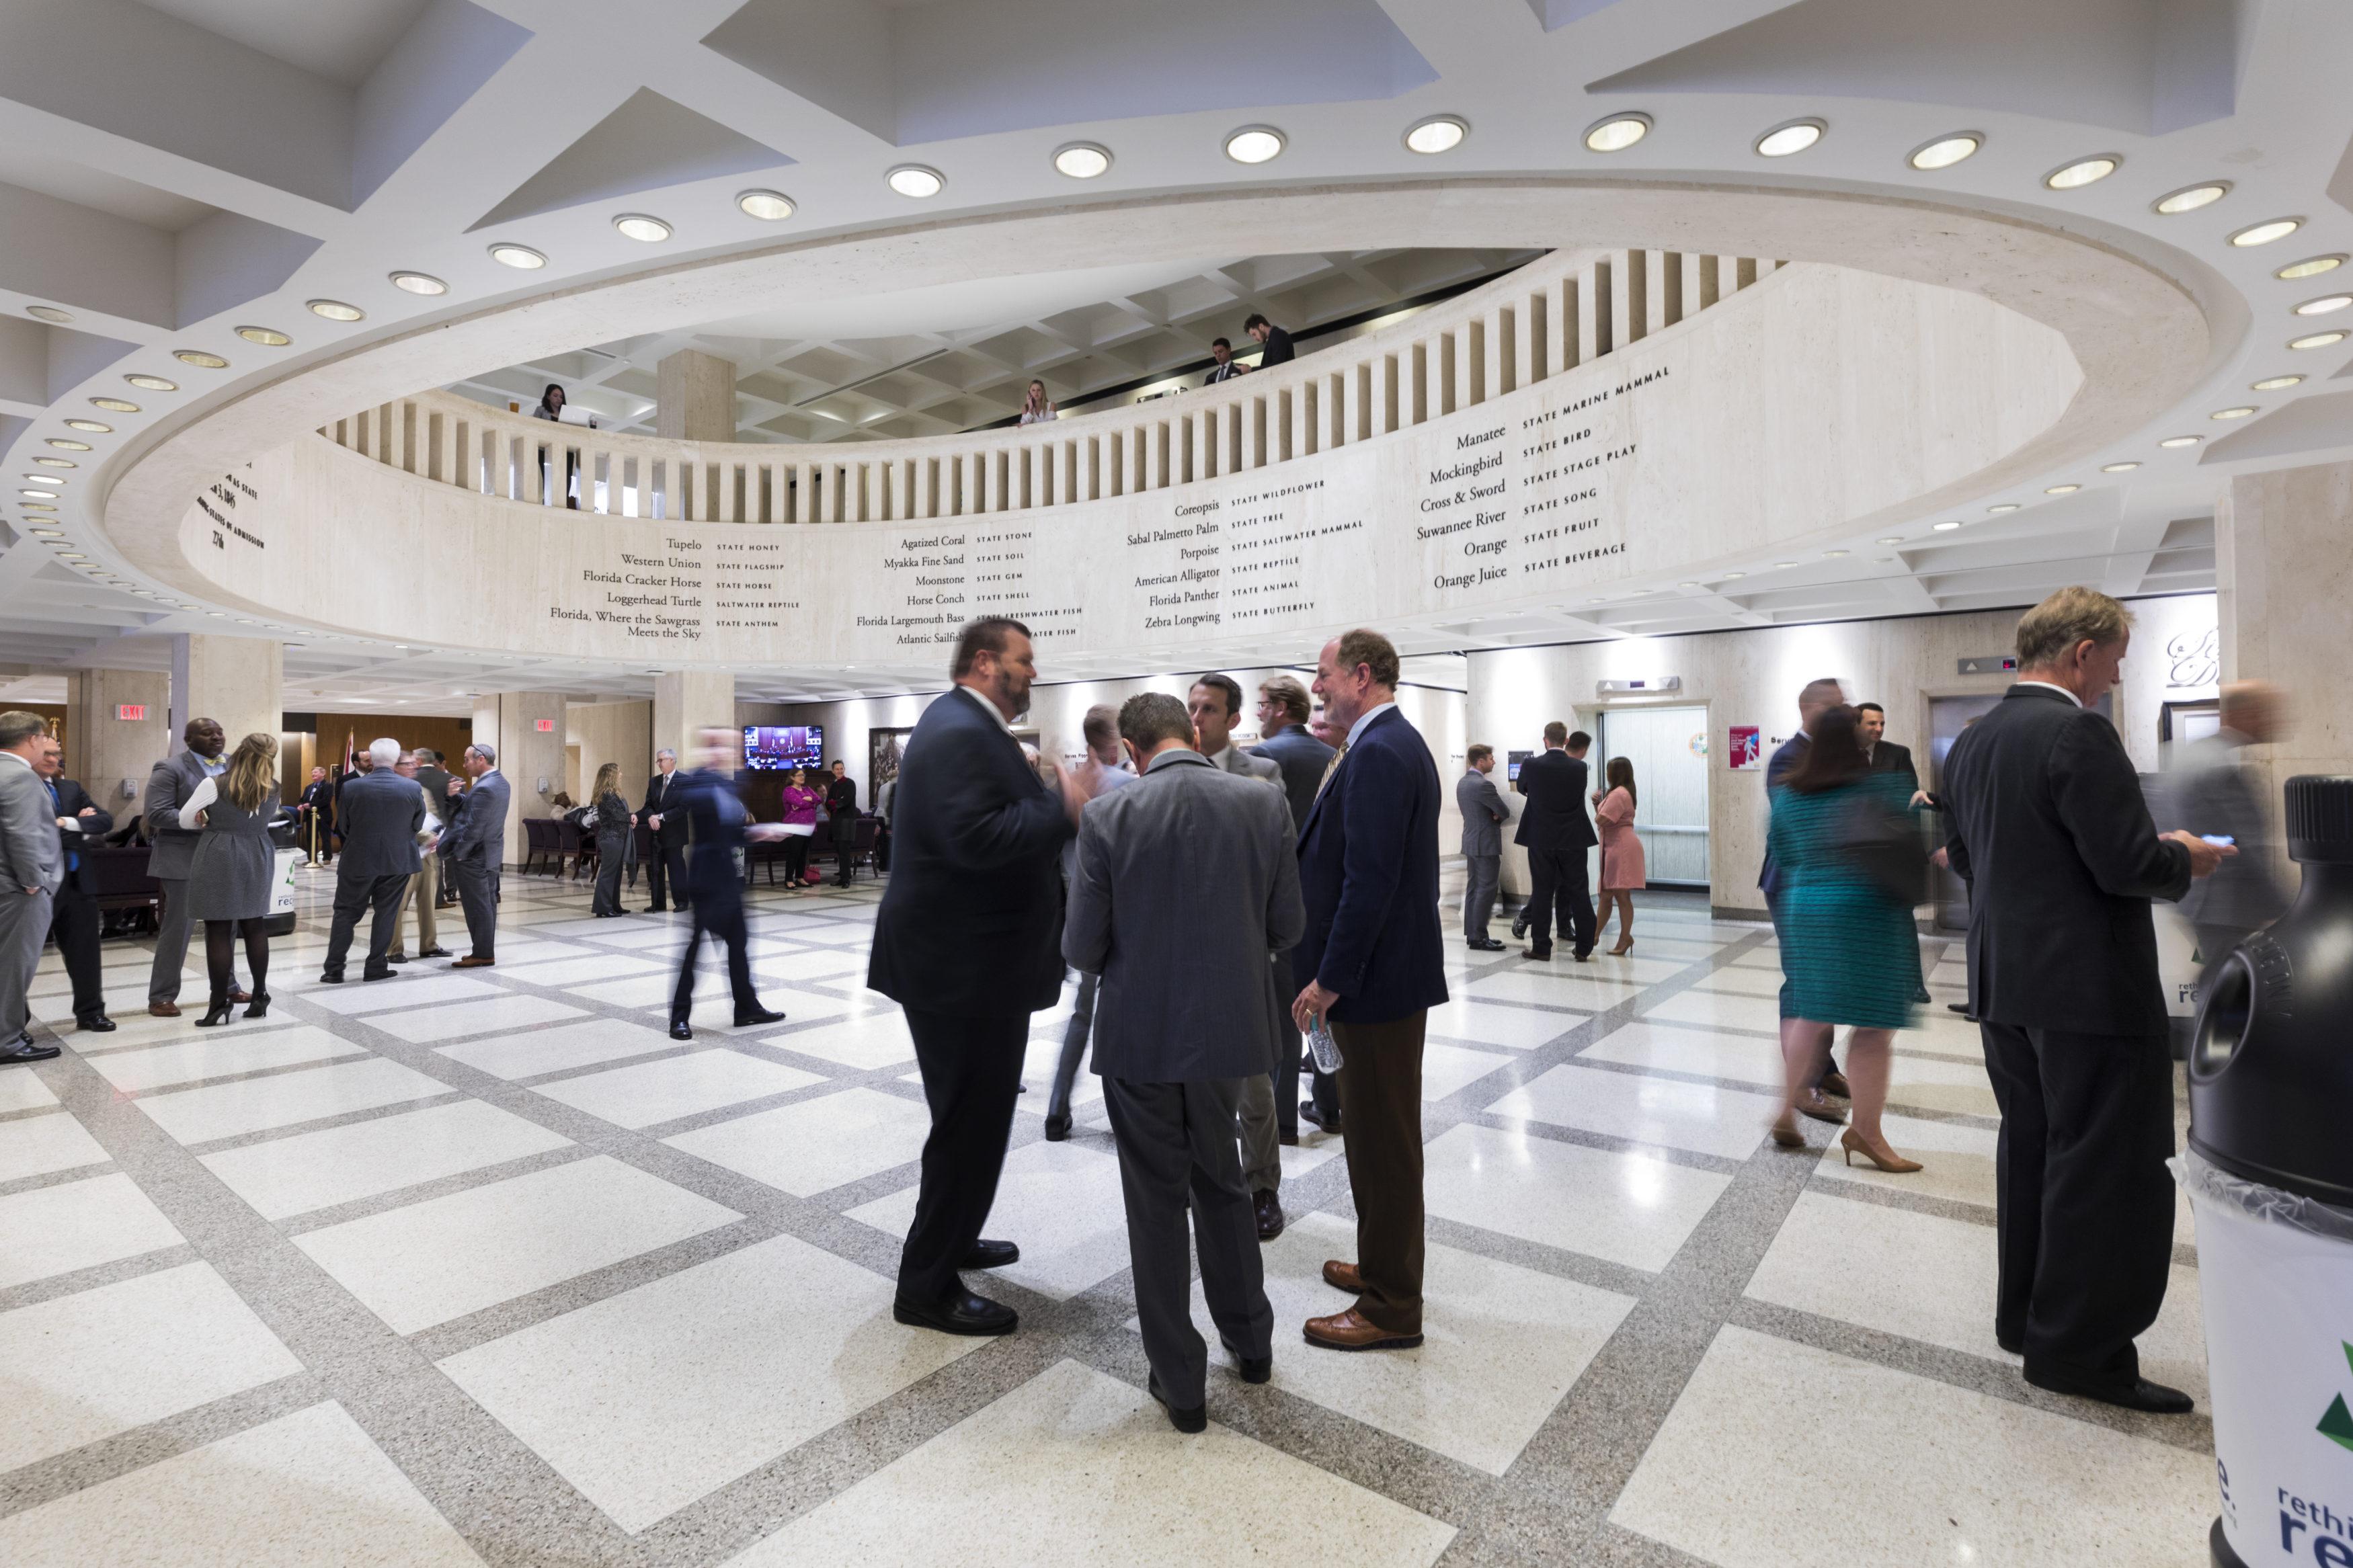 Capitol-Rotunda-March-2018-6-3500x2333.jpg